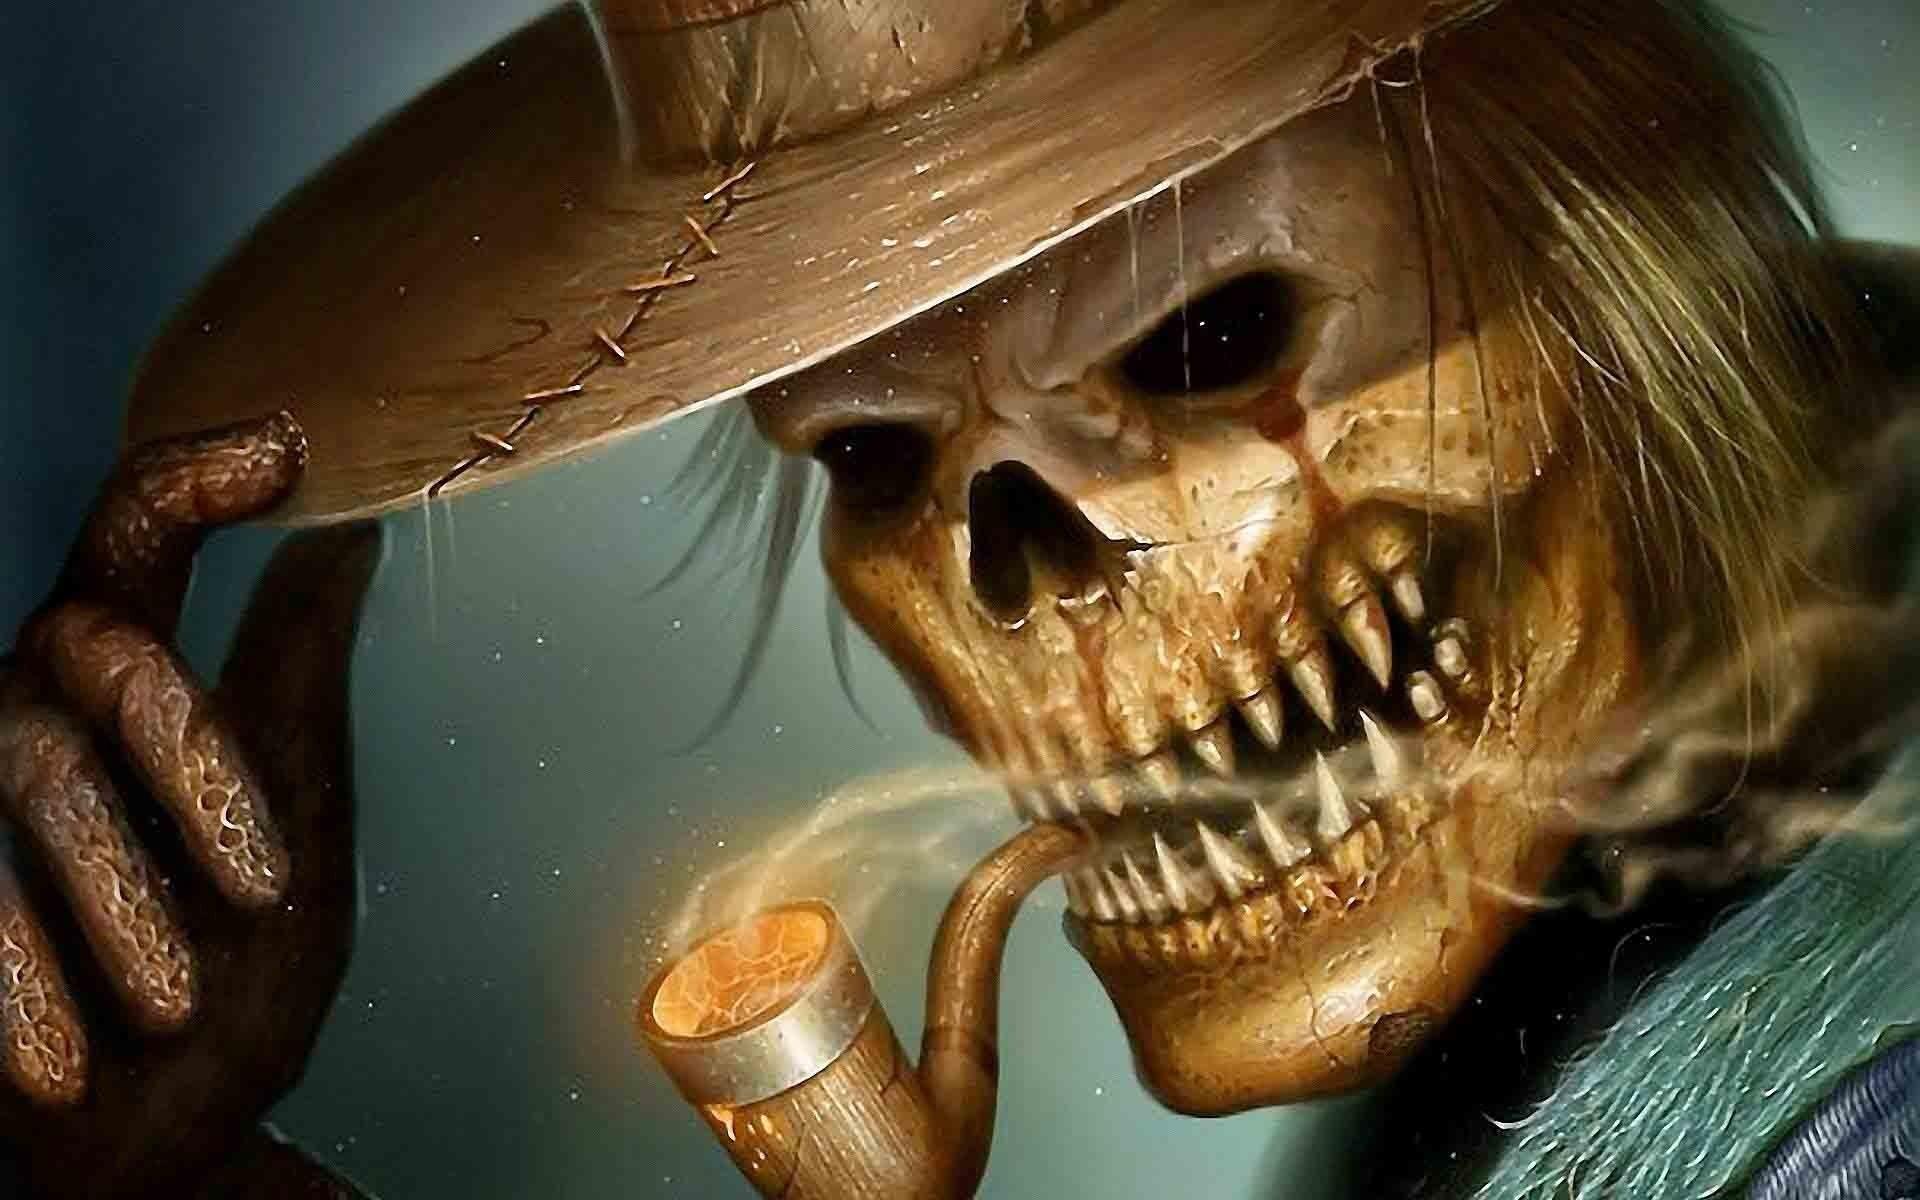 Halloween Skeleton Wallpaper.Skeleton Wallpaper 55 Pictures